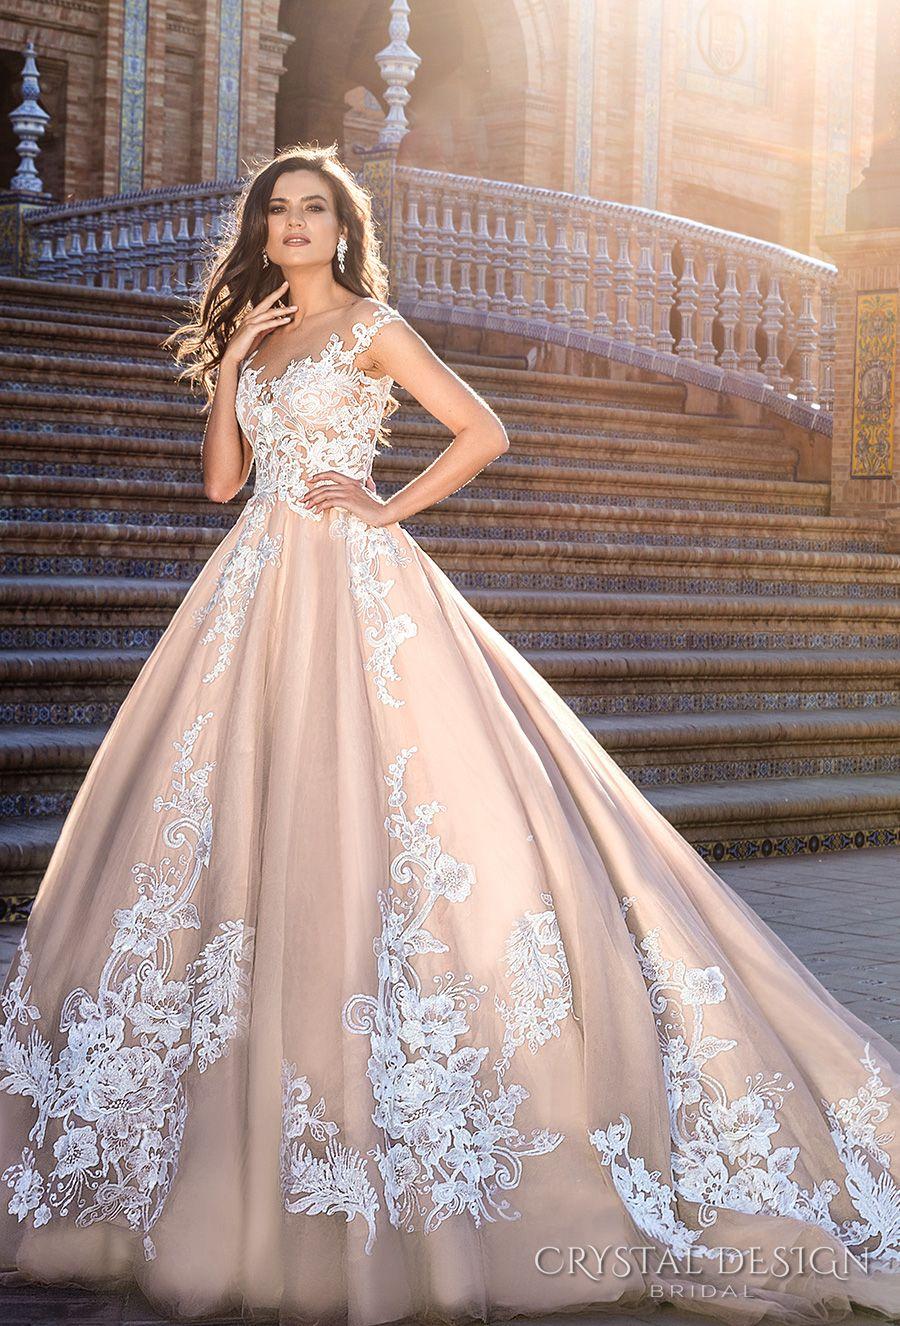 Blush Ball Gown Wedding Dresses 2017 Crystal Design Bridal